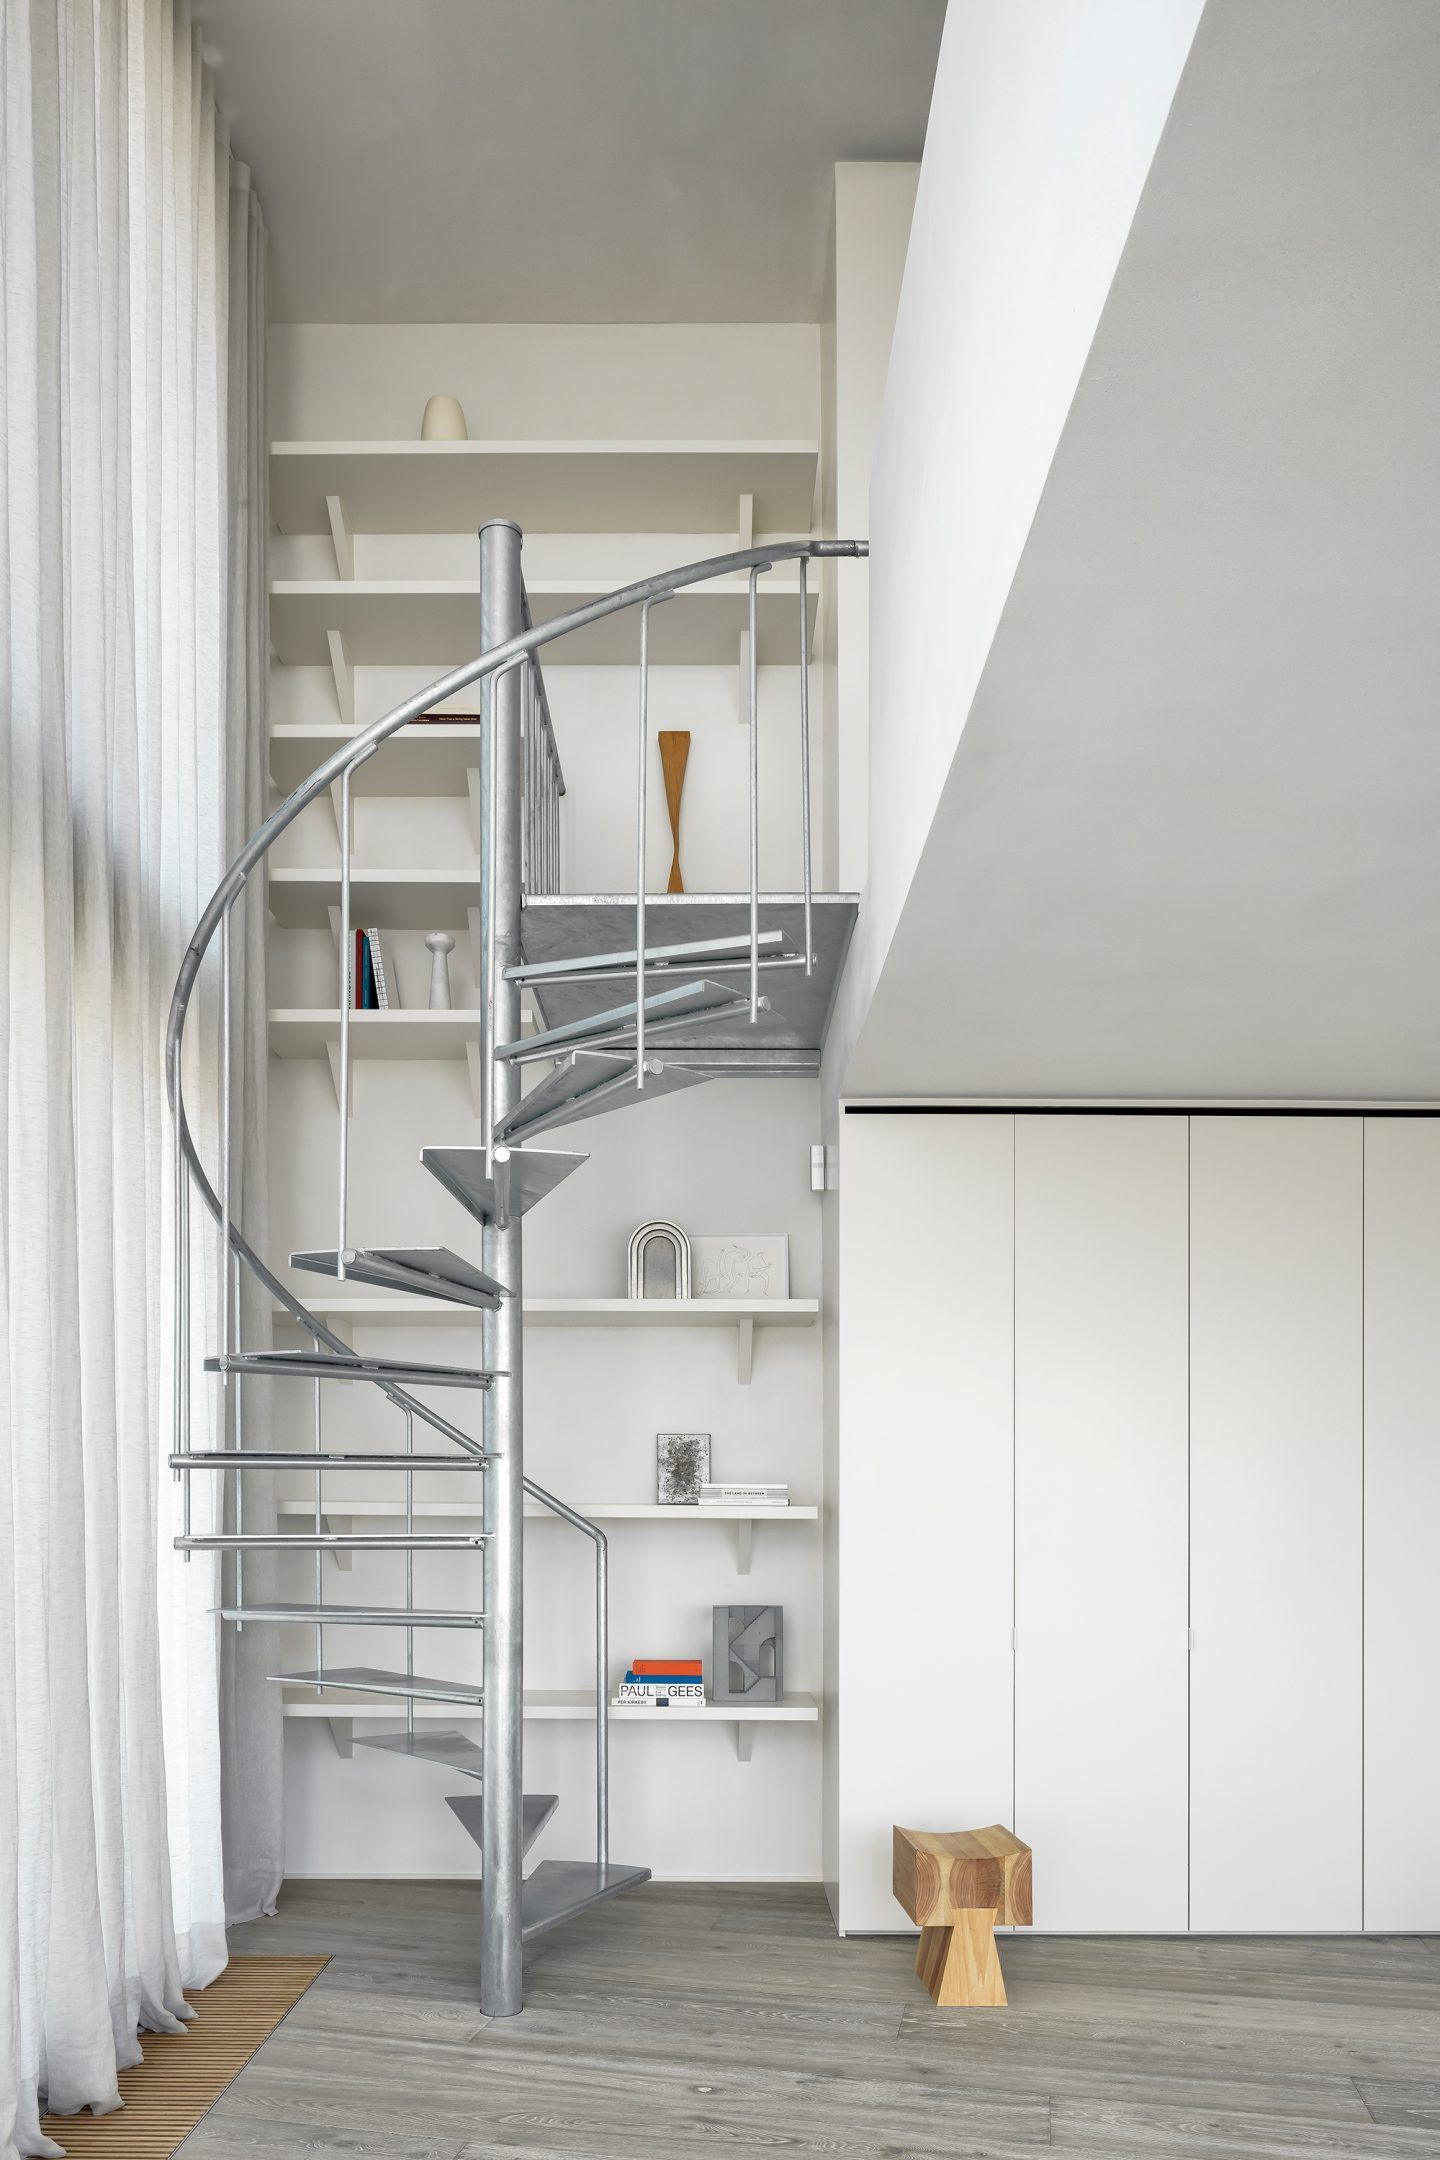 IGNANT-Architecture-Belgian-House-13